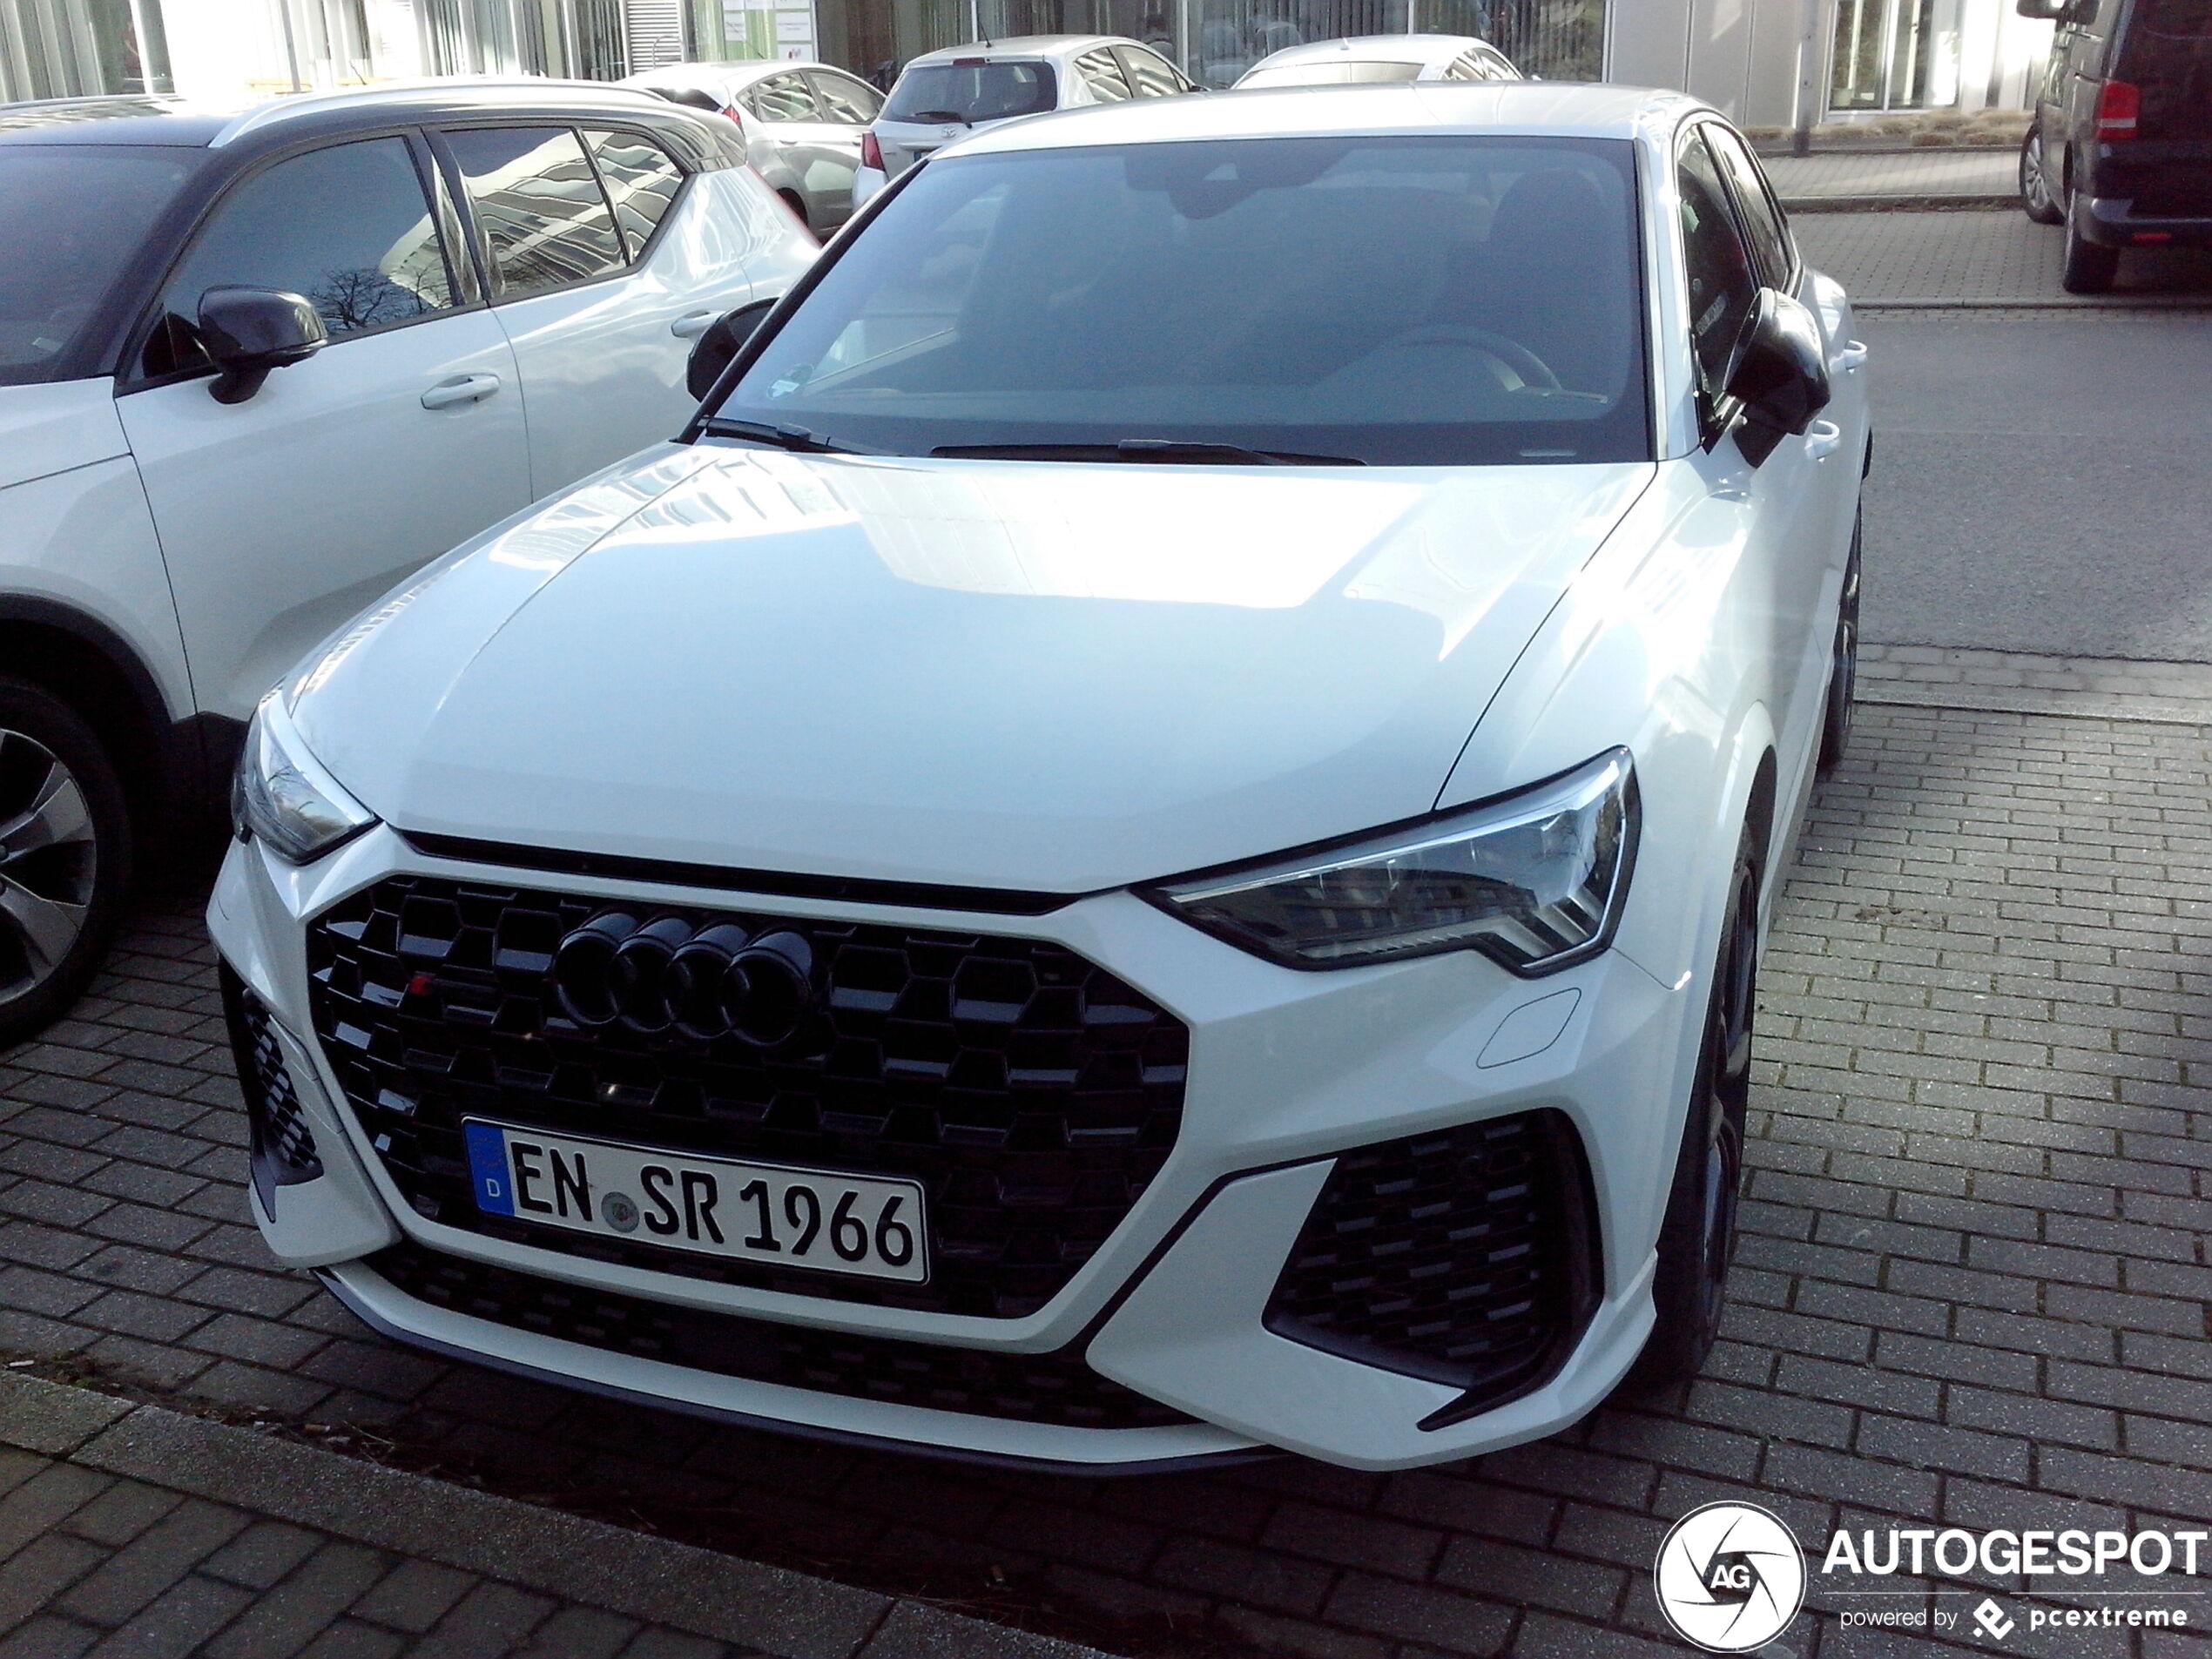 Kelebihan Audi Sr Top Model Tahun Ini